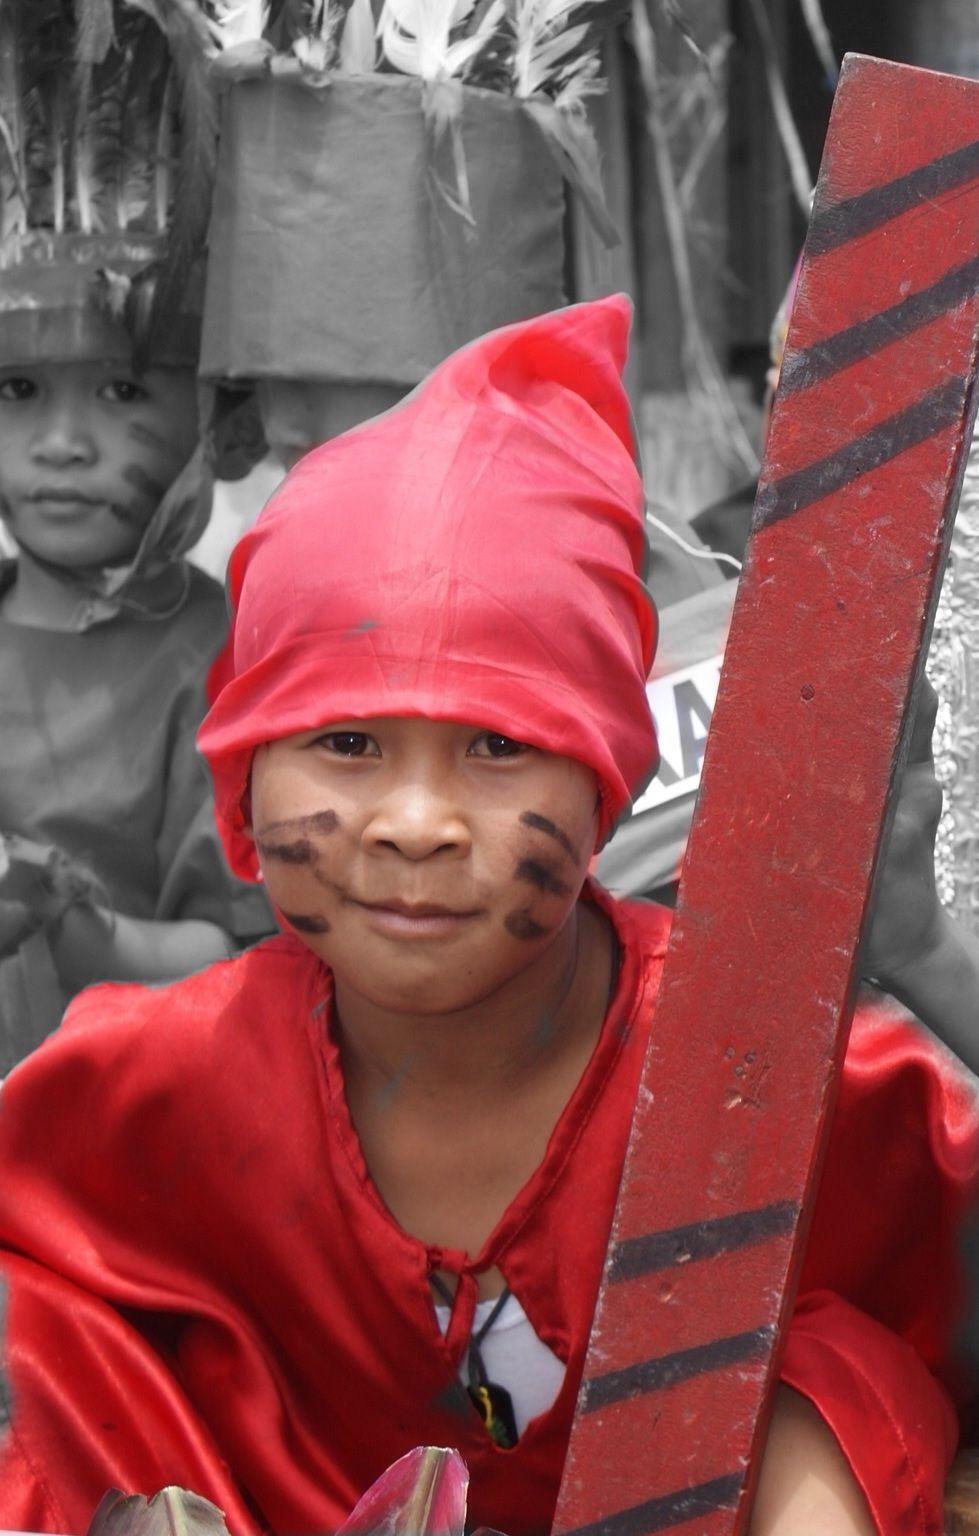 Gambar Pahlawan Nasional Kapitan Pattimura